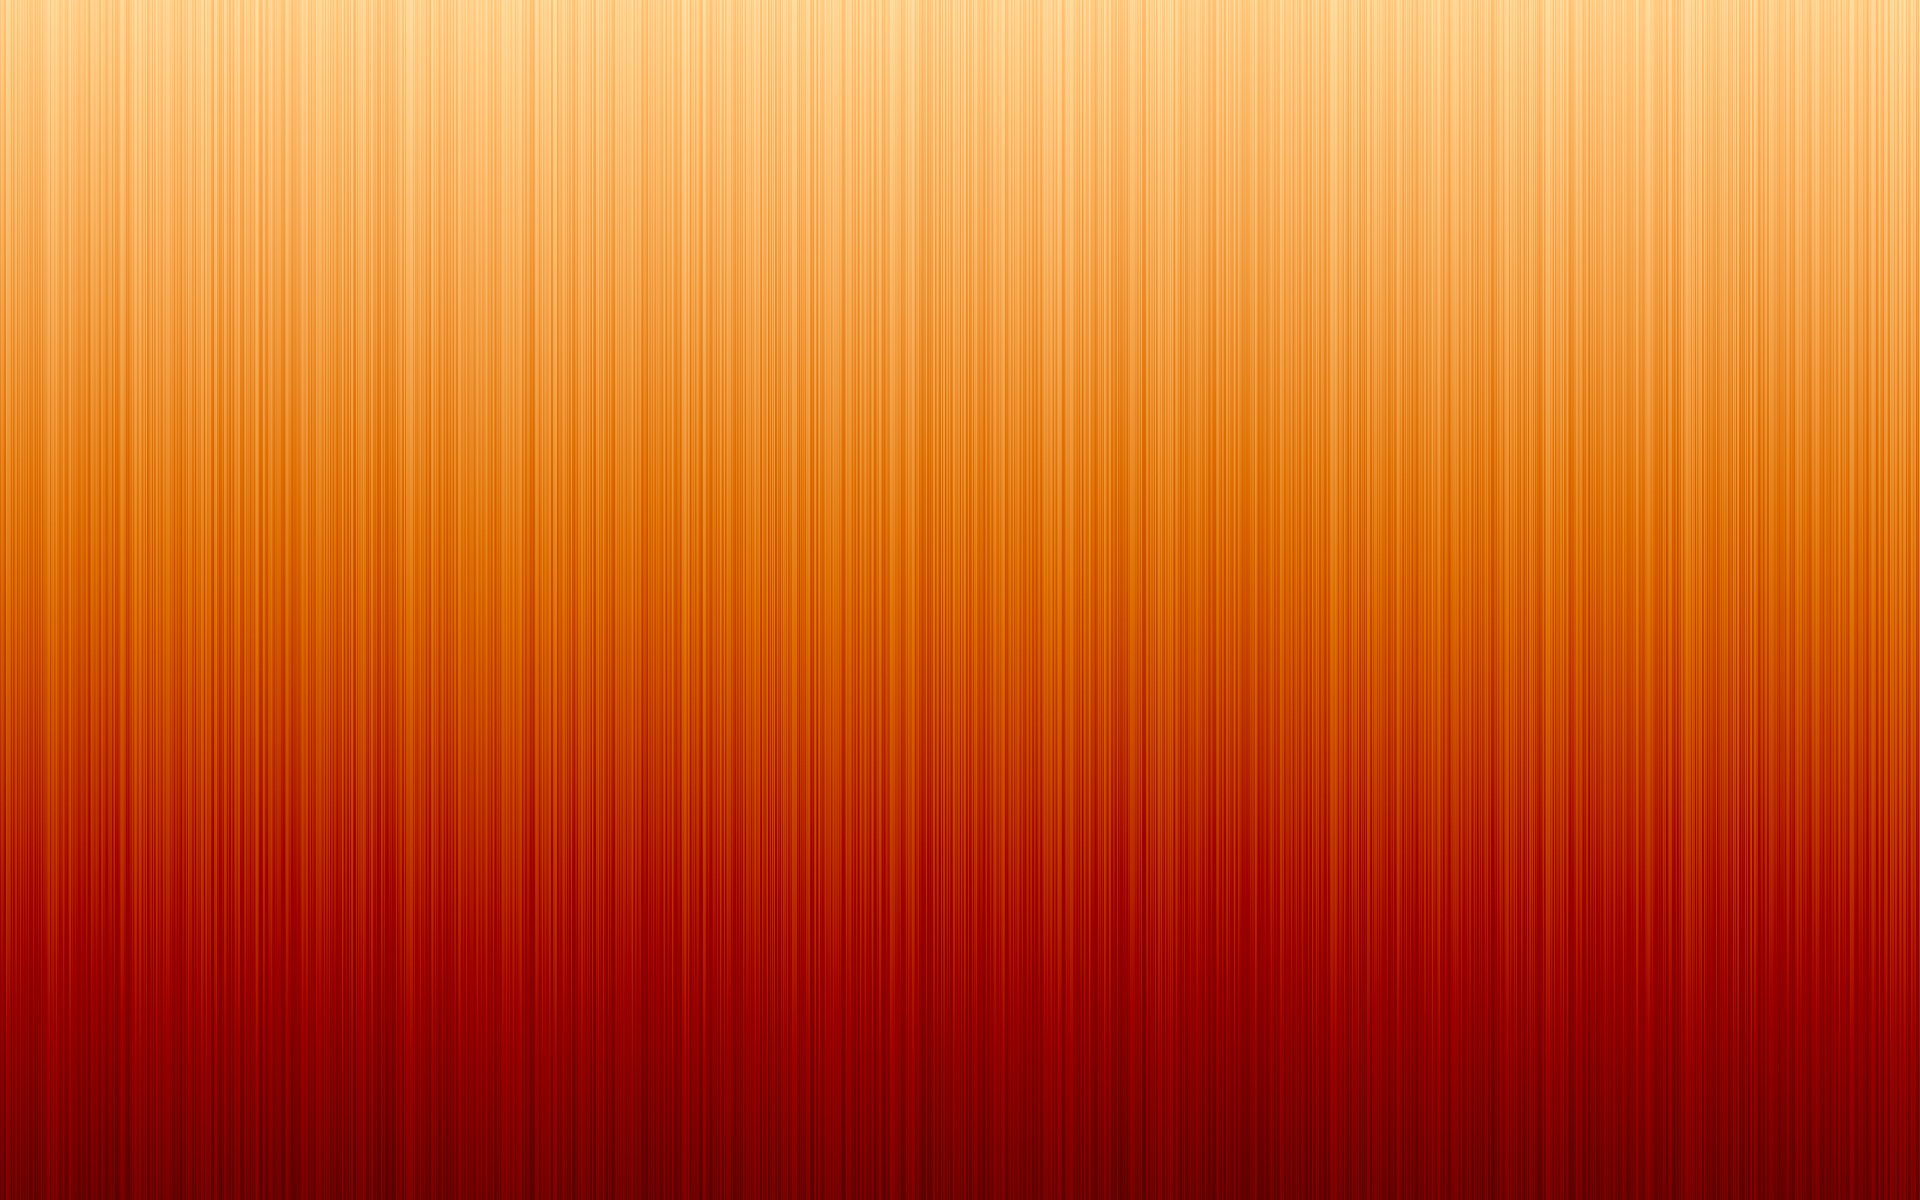 Orange Wallpaper 20 1920x1200